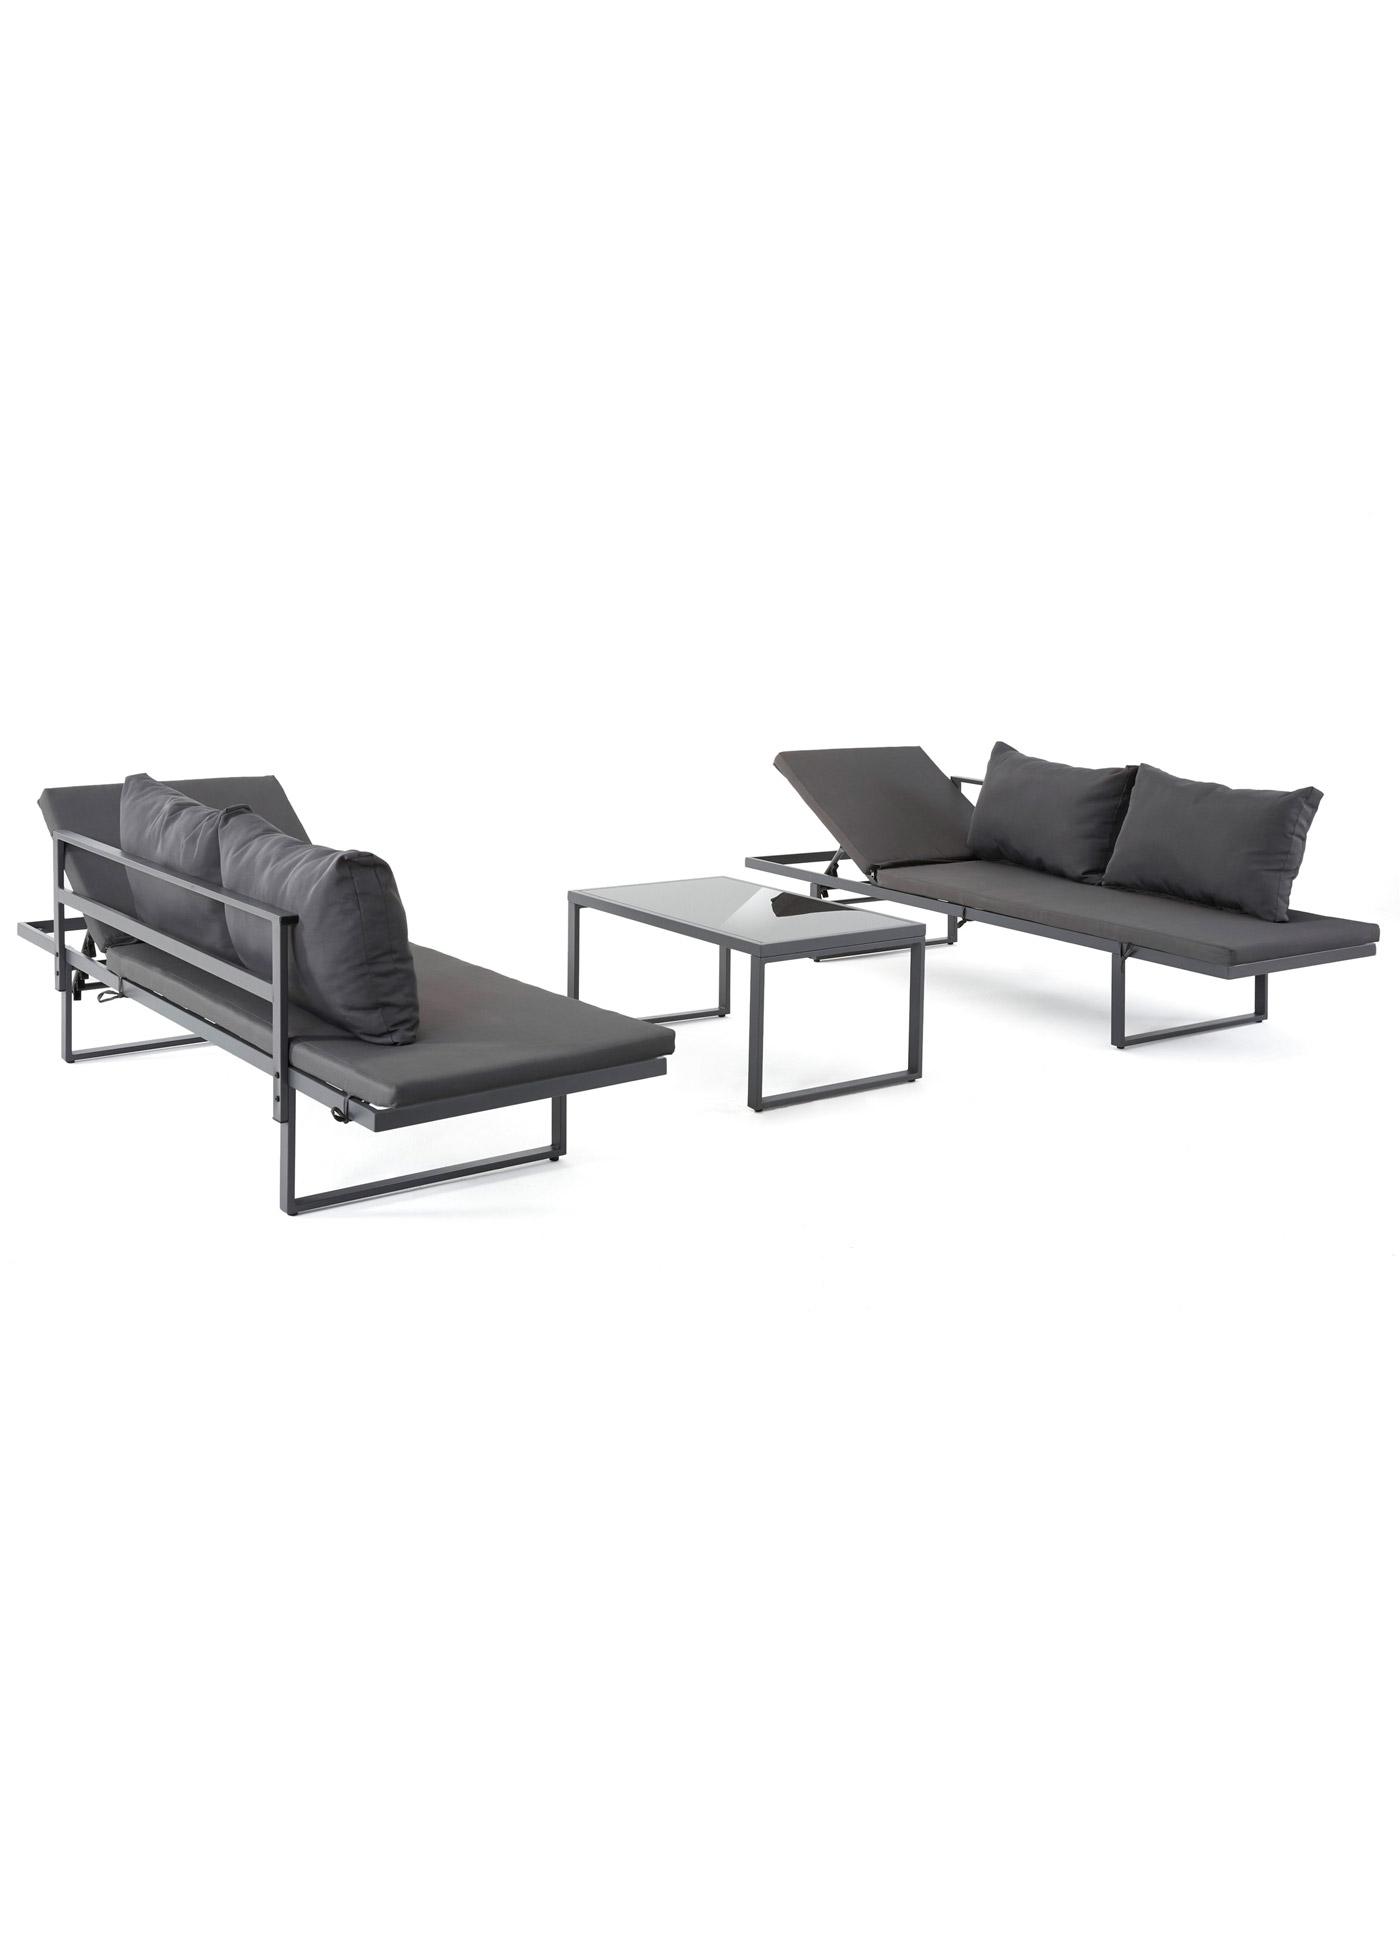 Set mobili da giardino (set 3 pezzi) (Grigio) - bpc living bonprix collection